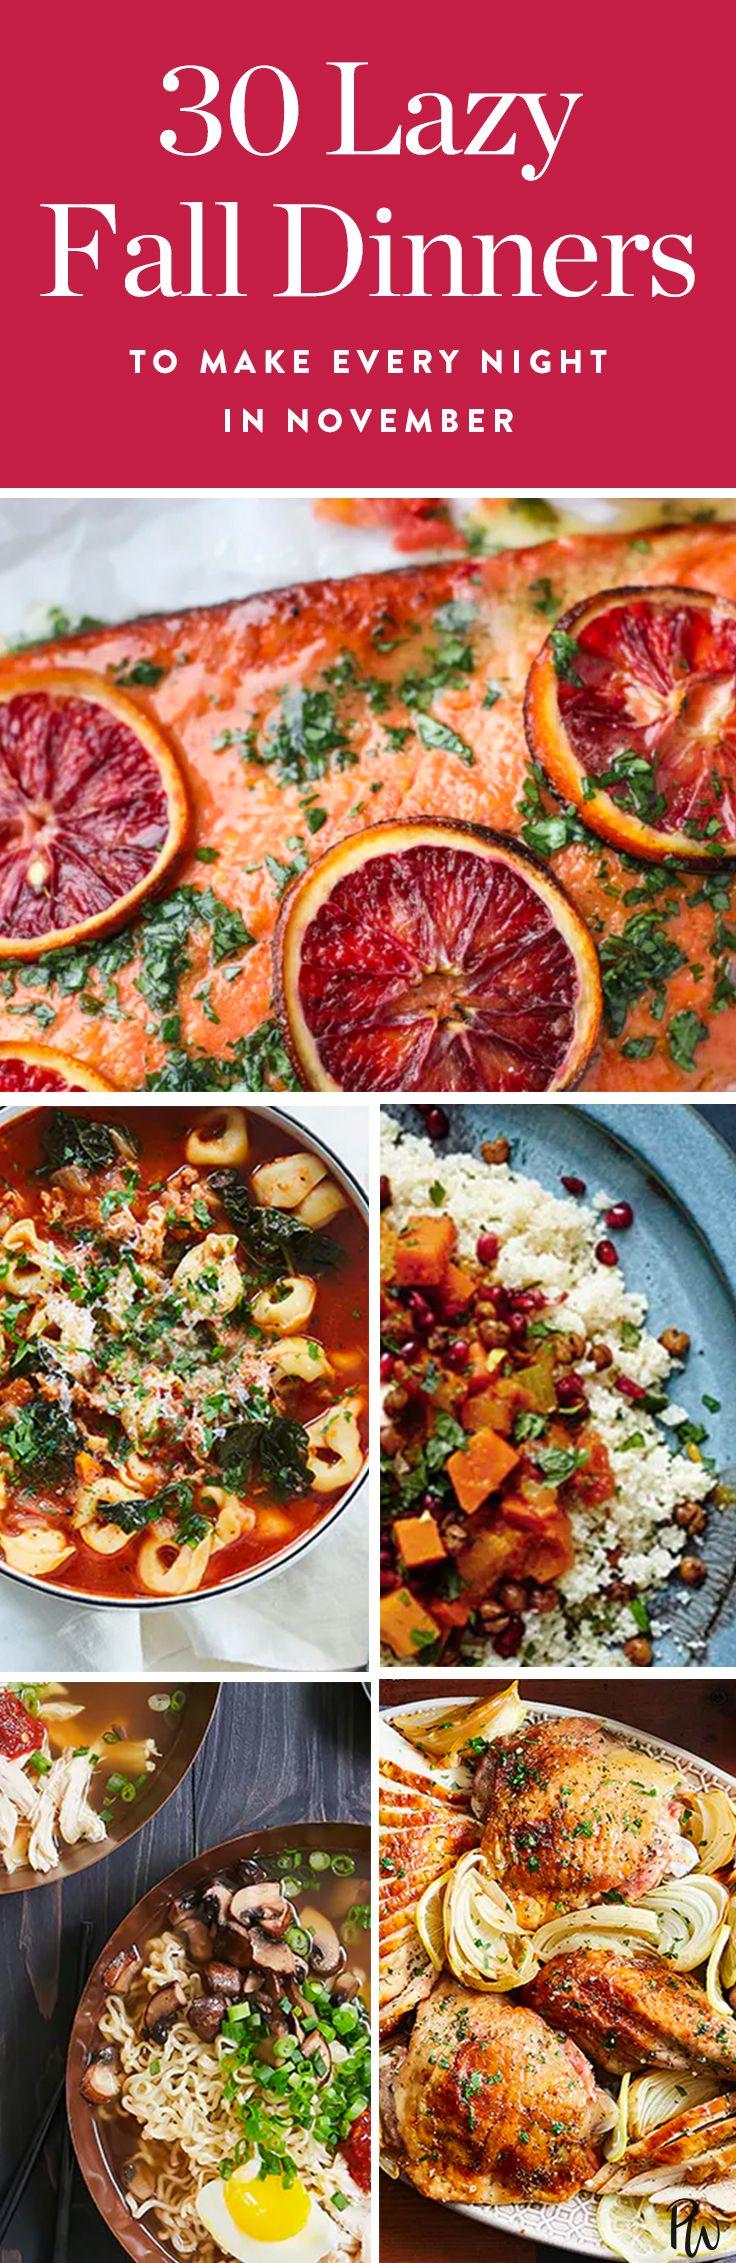 30 Low-Maintenance Dinners to Make Every Night in November (Yep, Even Thanksgiving) via @PureWow via @PureWow